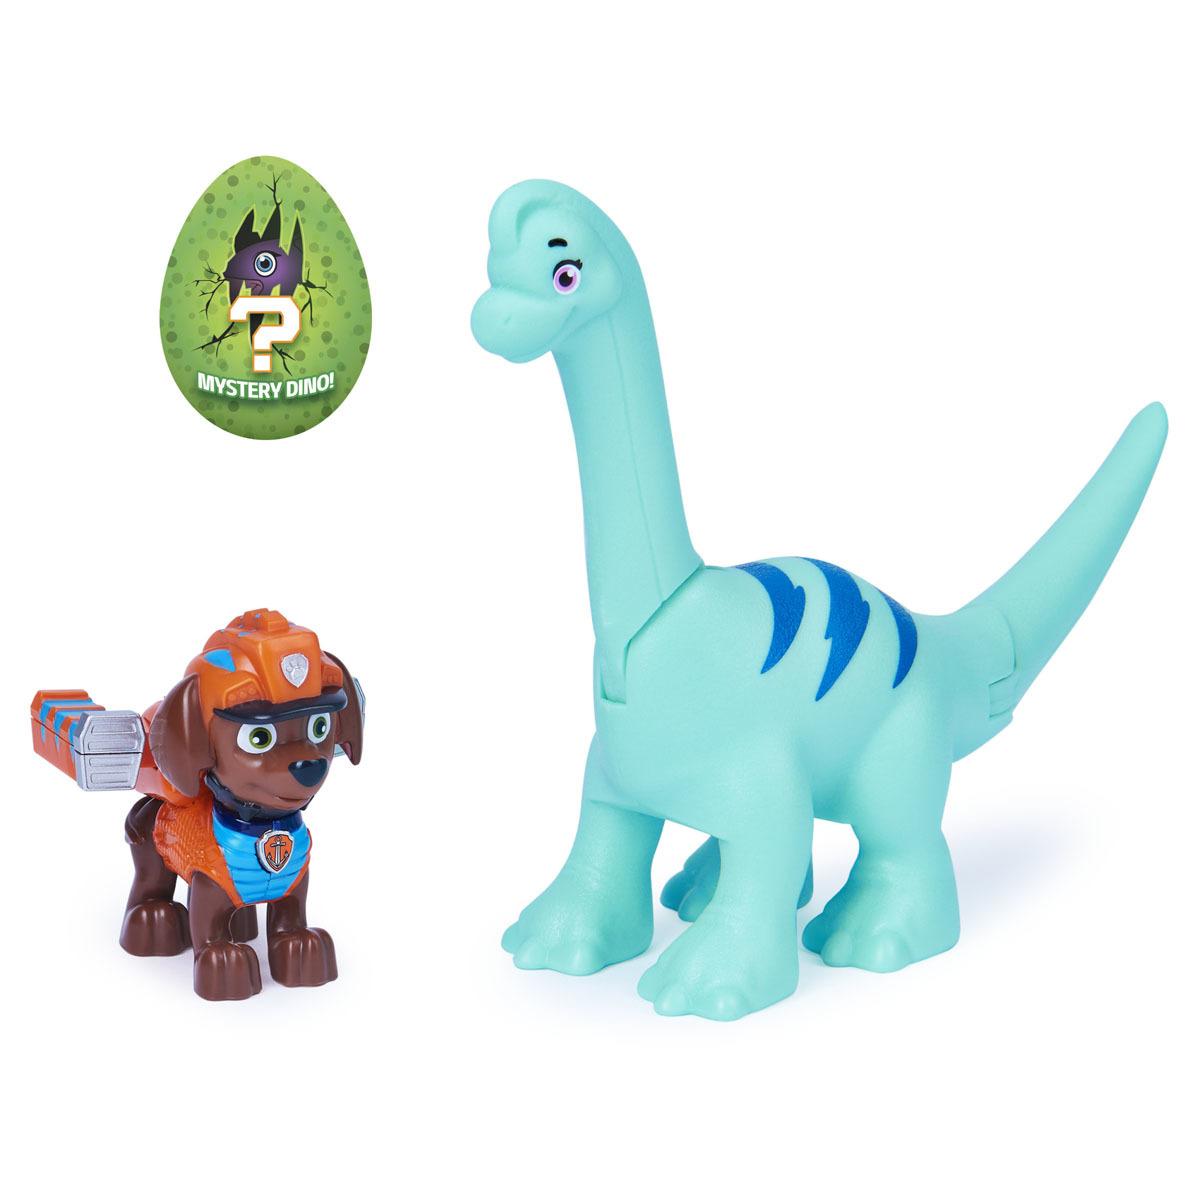 Paw Patrol Dino Rescue Figures and Mystery Dinosaur - Zuma and Brontosaurus